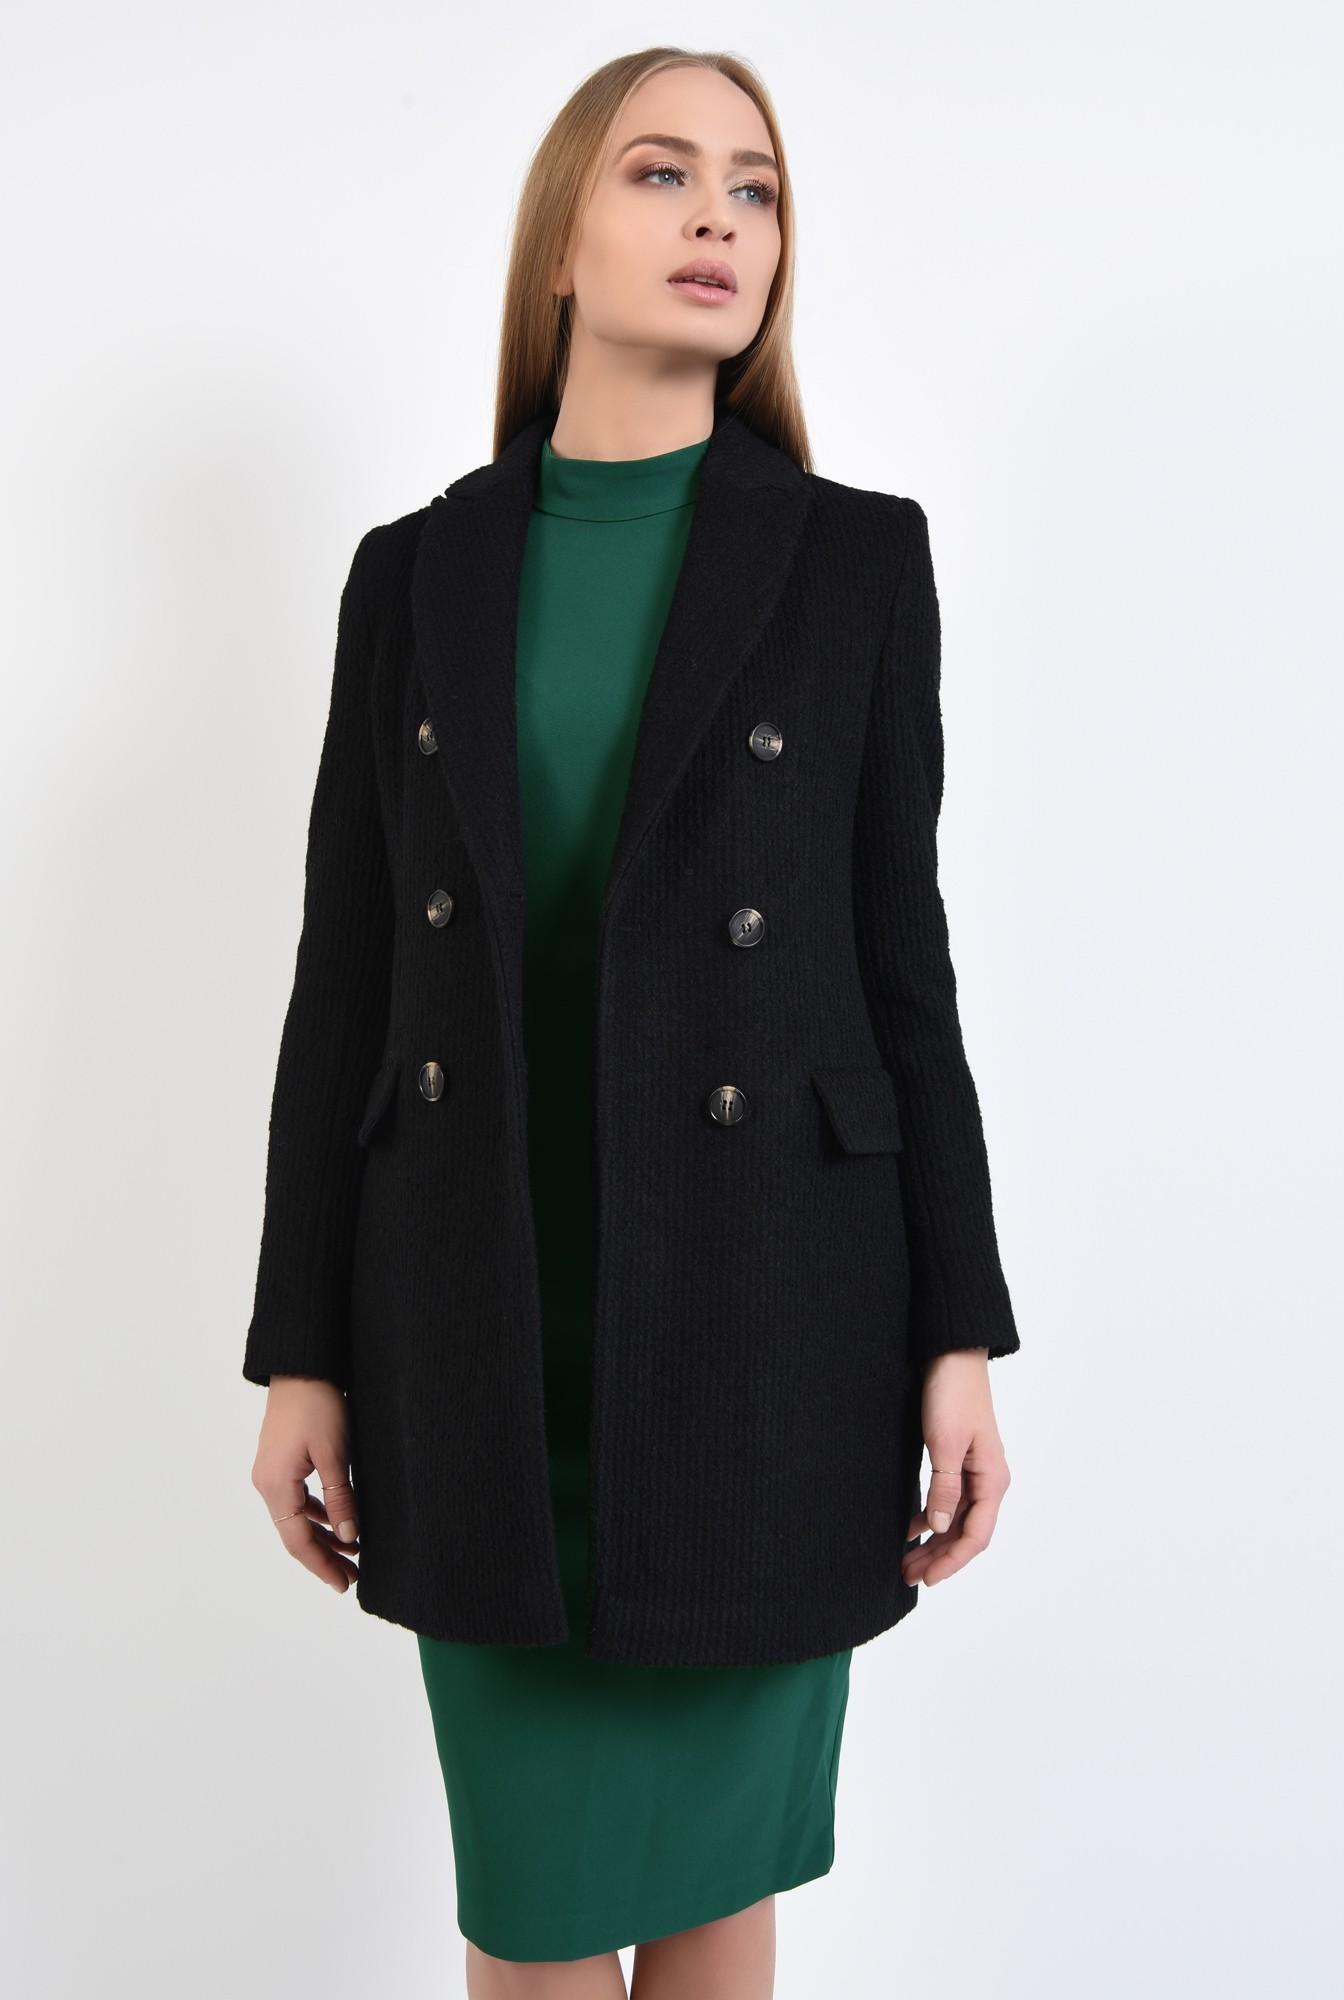 2 - palton dama, online, negru, drept, doua randuri de nasturi